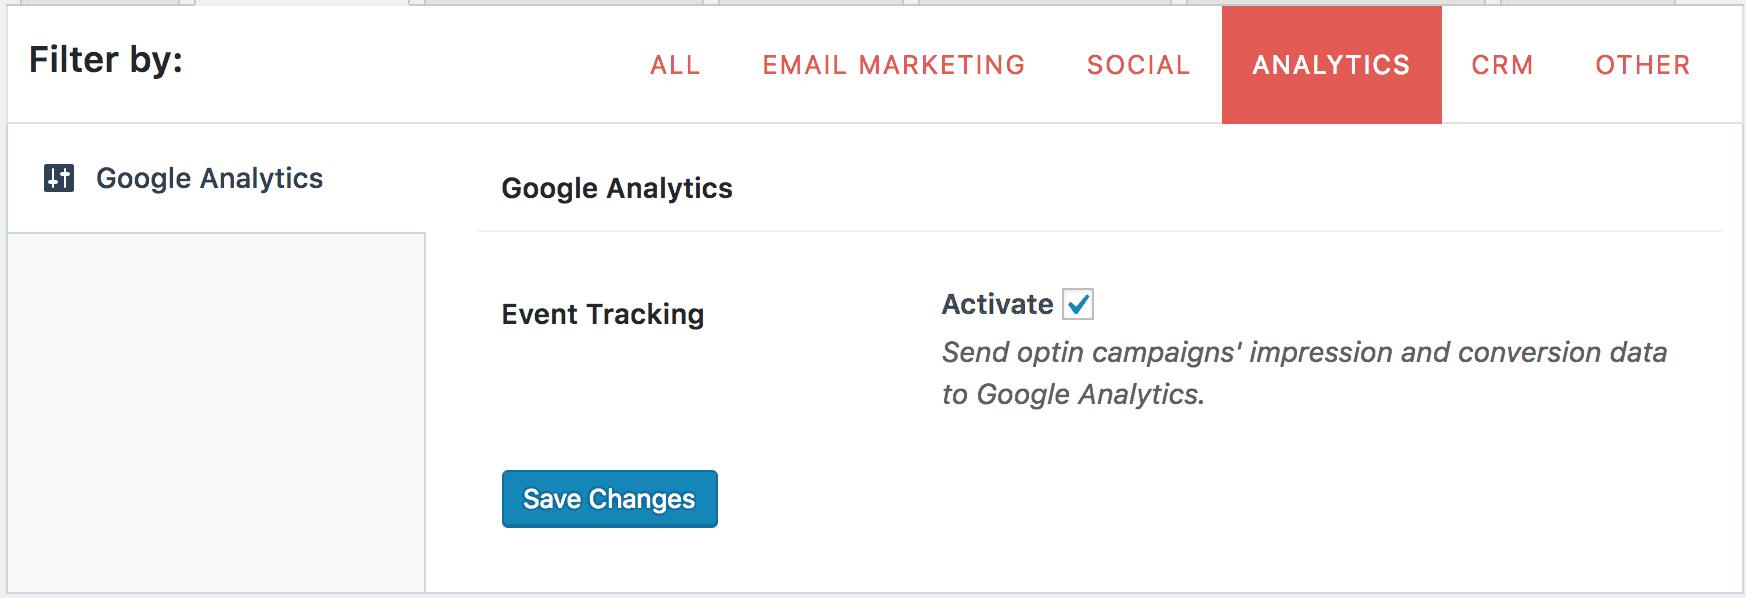 Google Analytics settings page